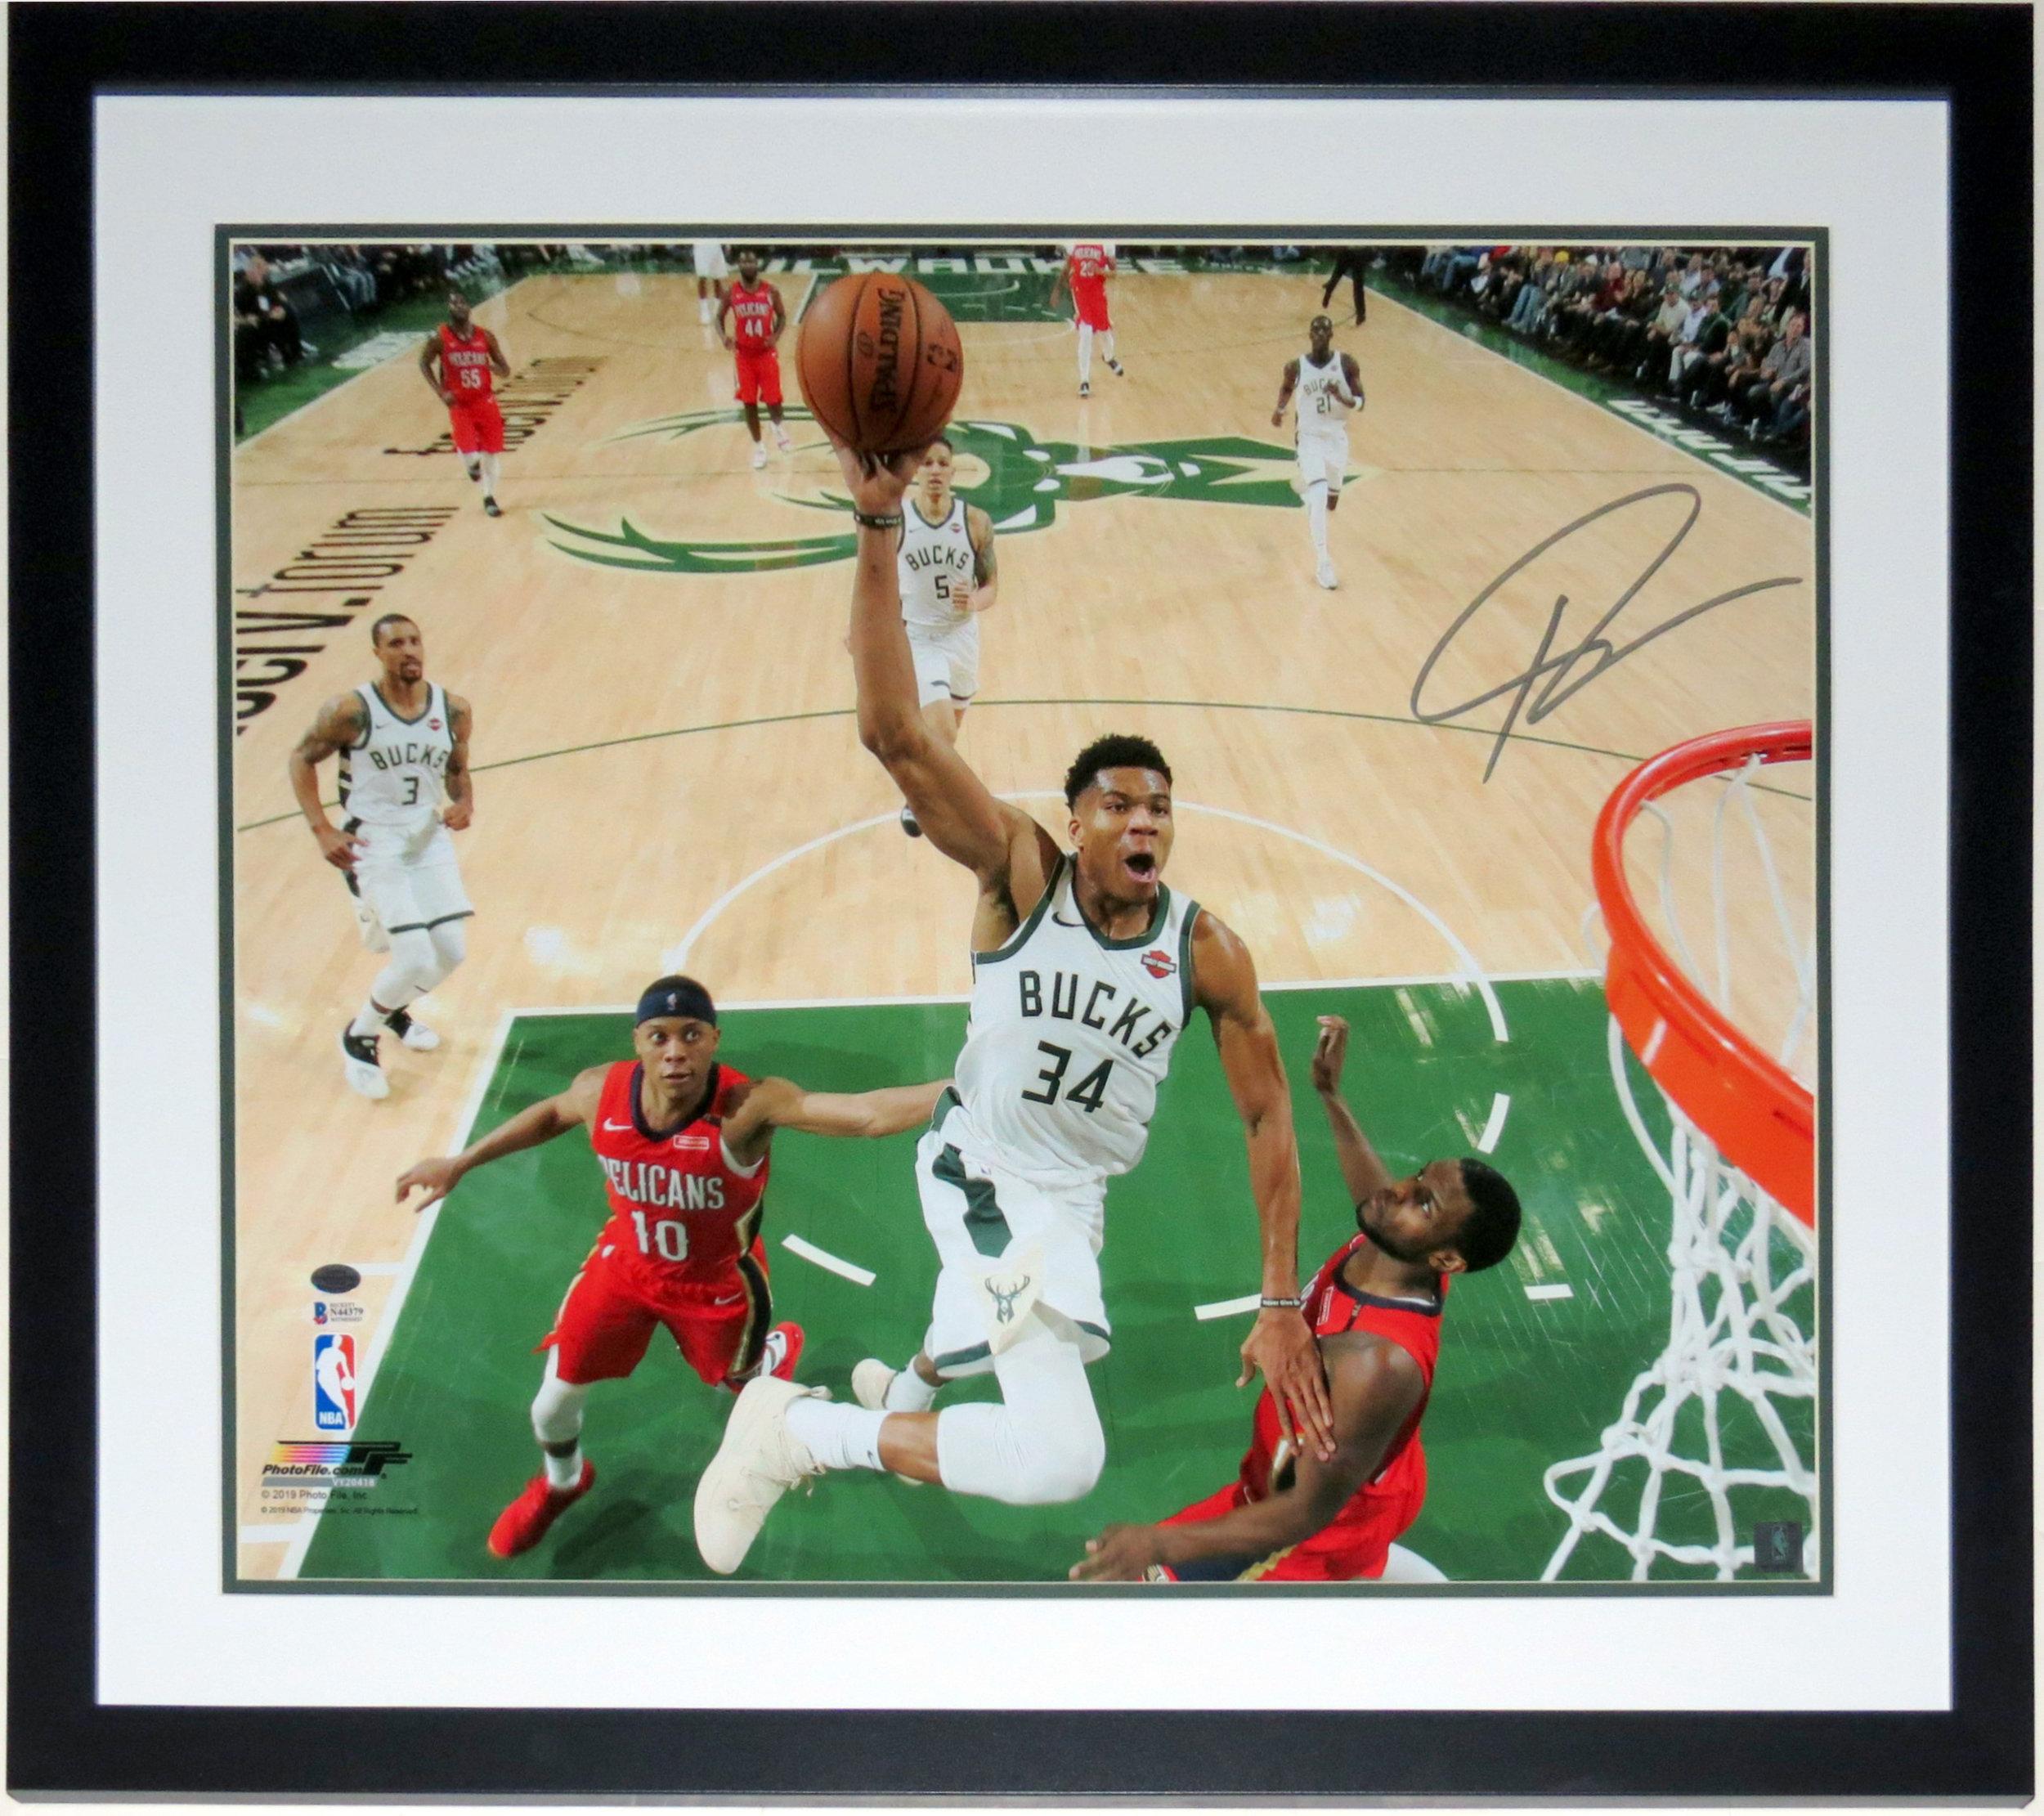 Giannis Antetokounmpo Signed 2019 Milwaukee Bucks 20x24 Photo - Beckett Authentication Services BAS COA - Professionally Framed